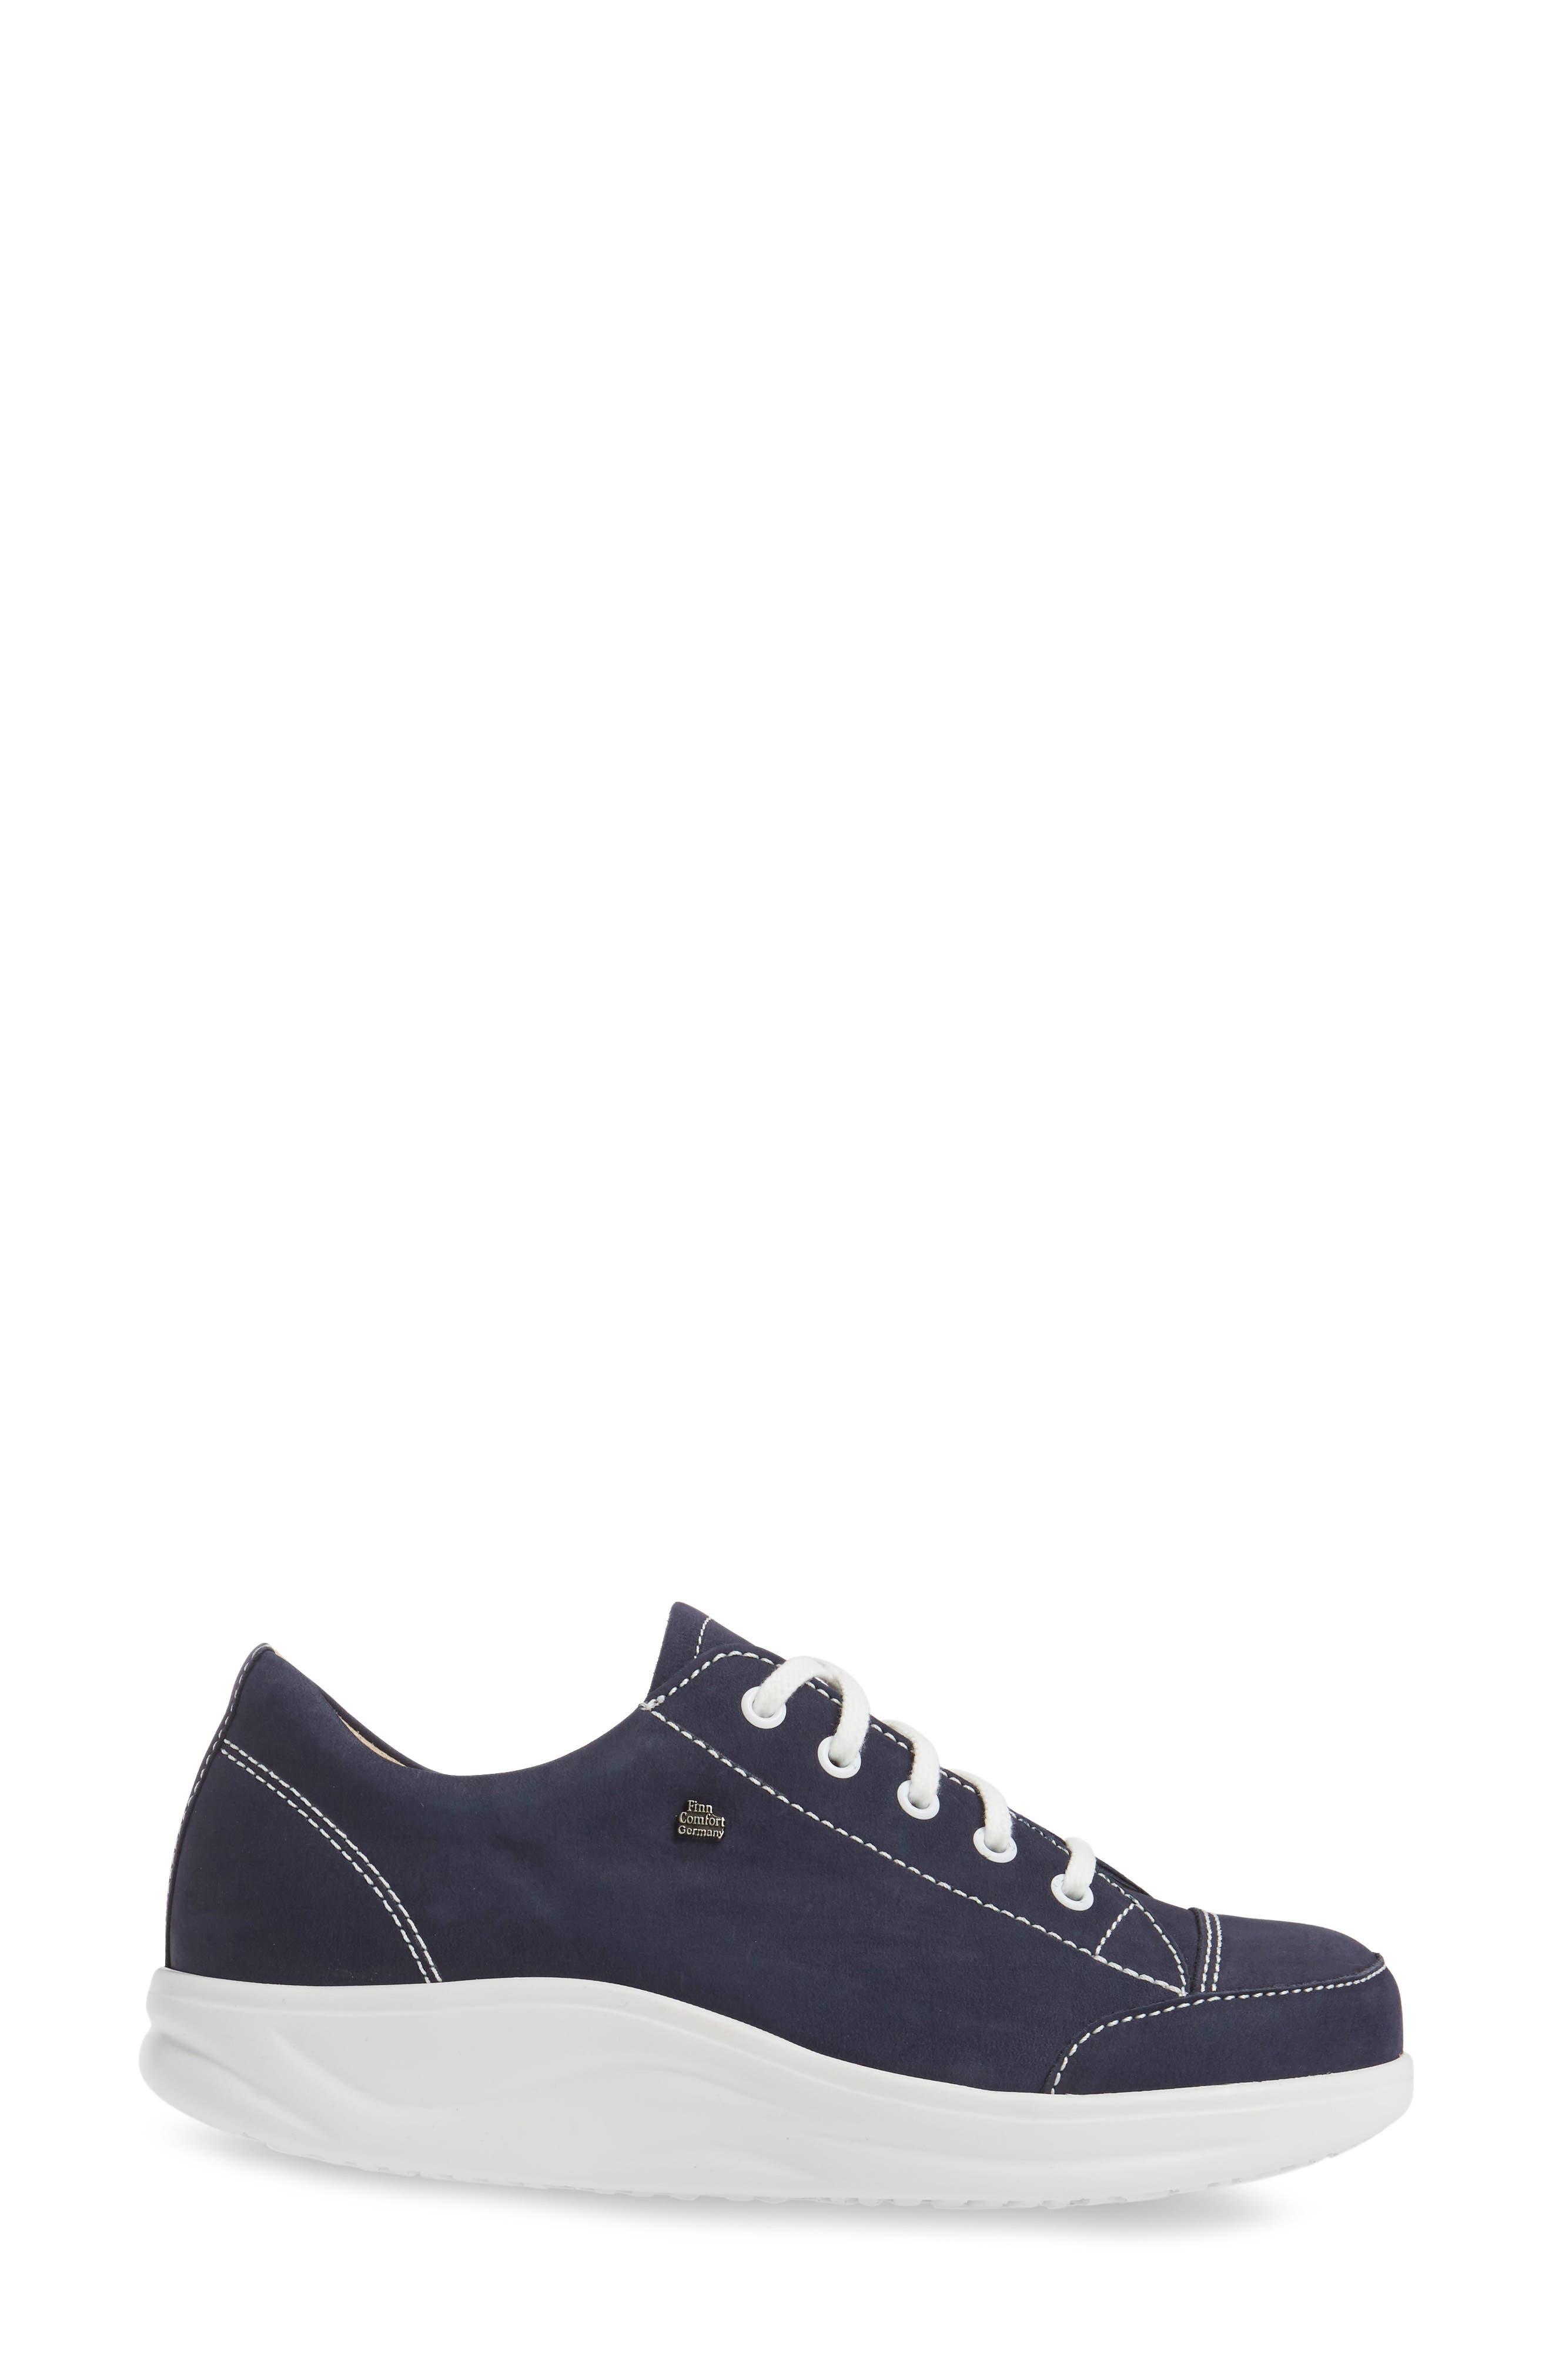 FINNAMIC by Finn Comfort 'Ikebukuro' Walking Shoe,                             Alternate thumbnail 3, color,                             Atlantic Leather